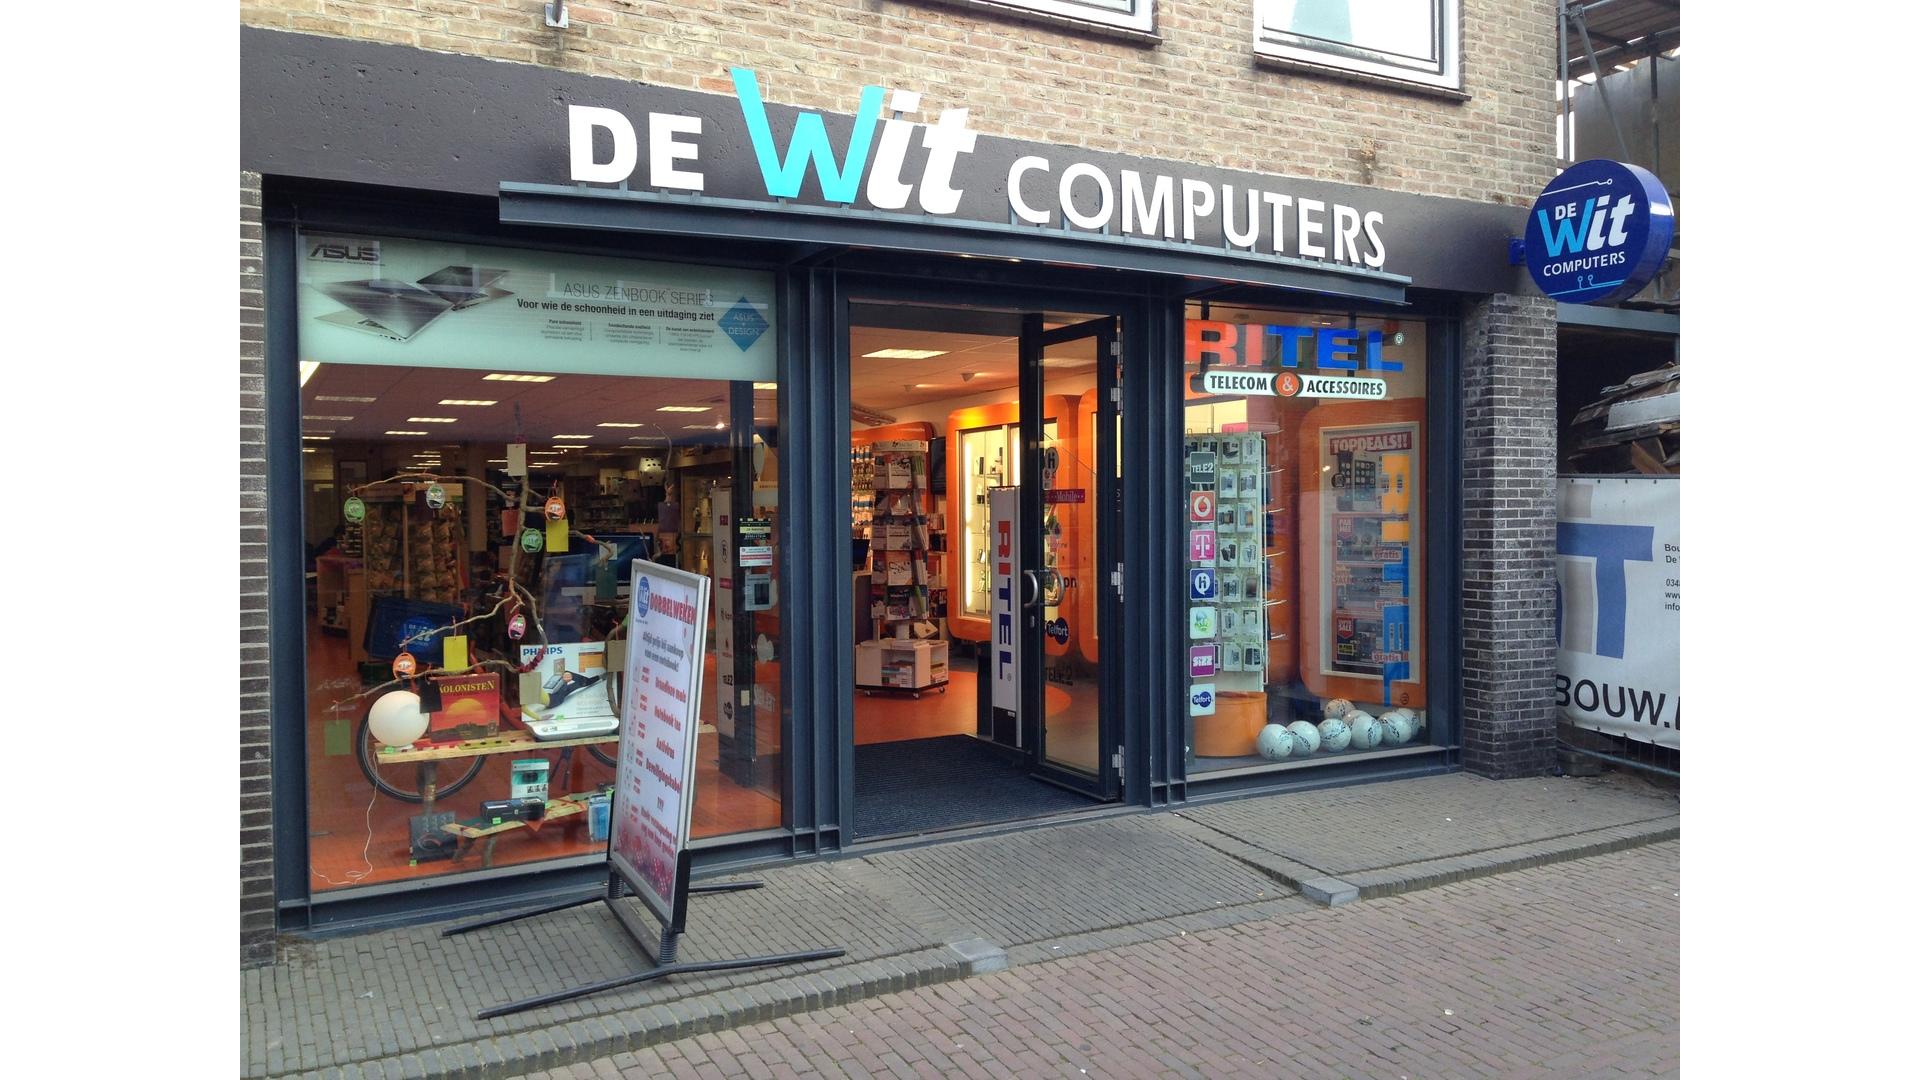 De Wit Computers